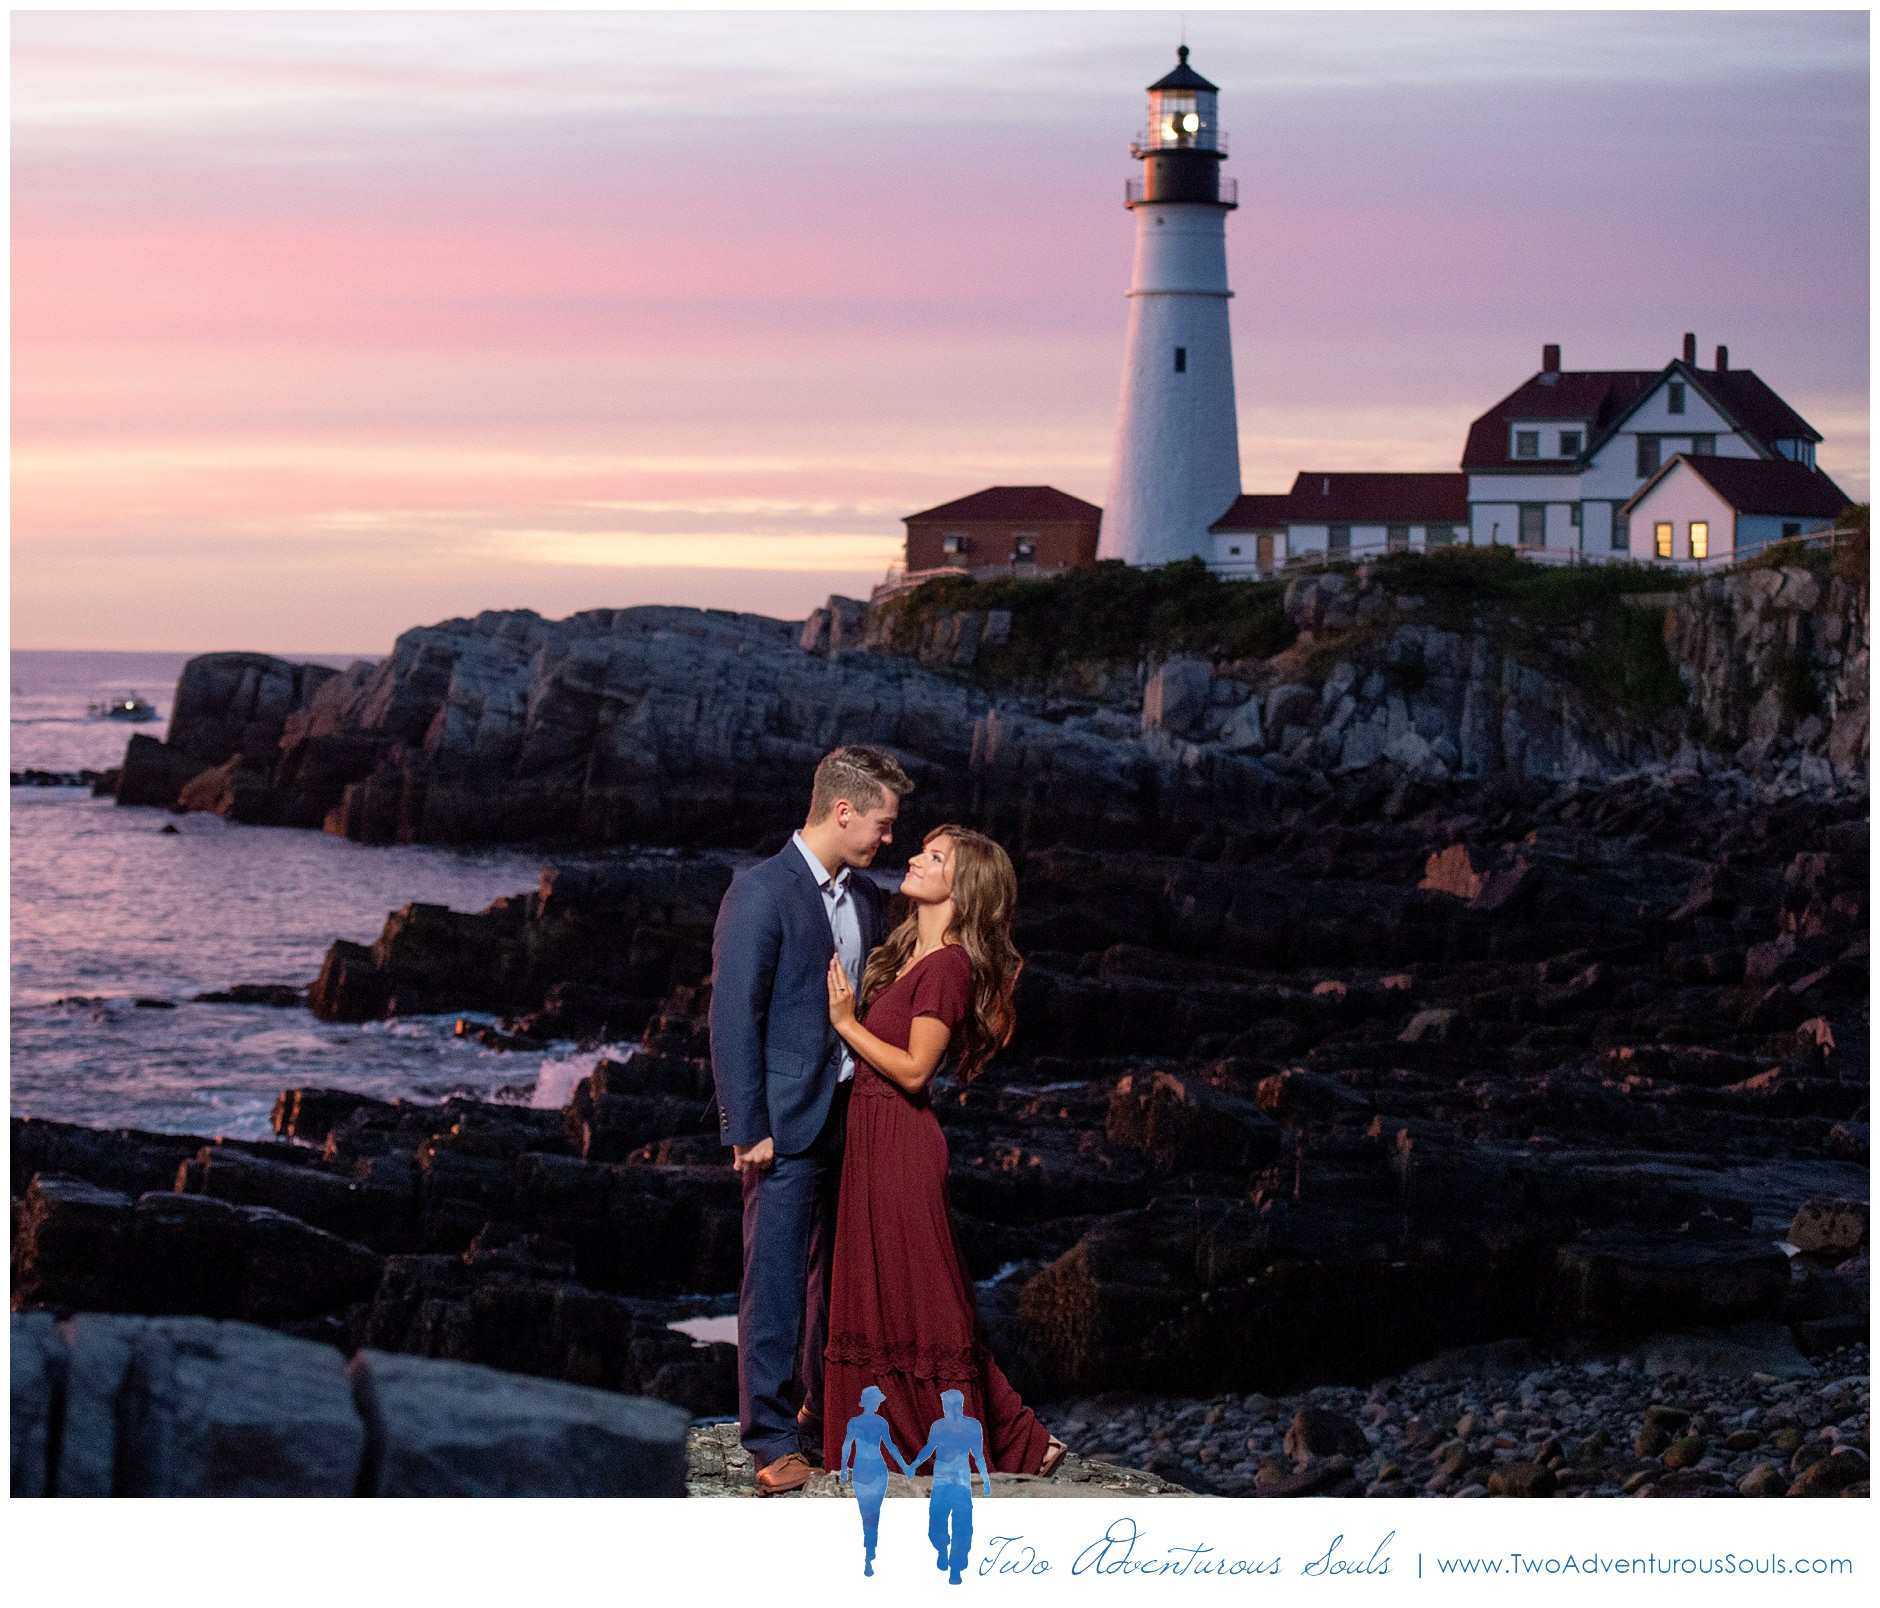 Destination Wedding, Carlin Bates, Evan Stewart, Maine Wedding Photographers, Two Adventurous Souls_0001.jpg